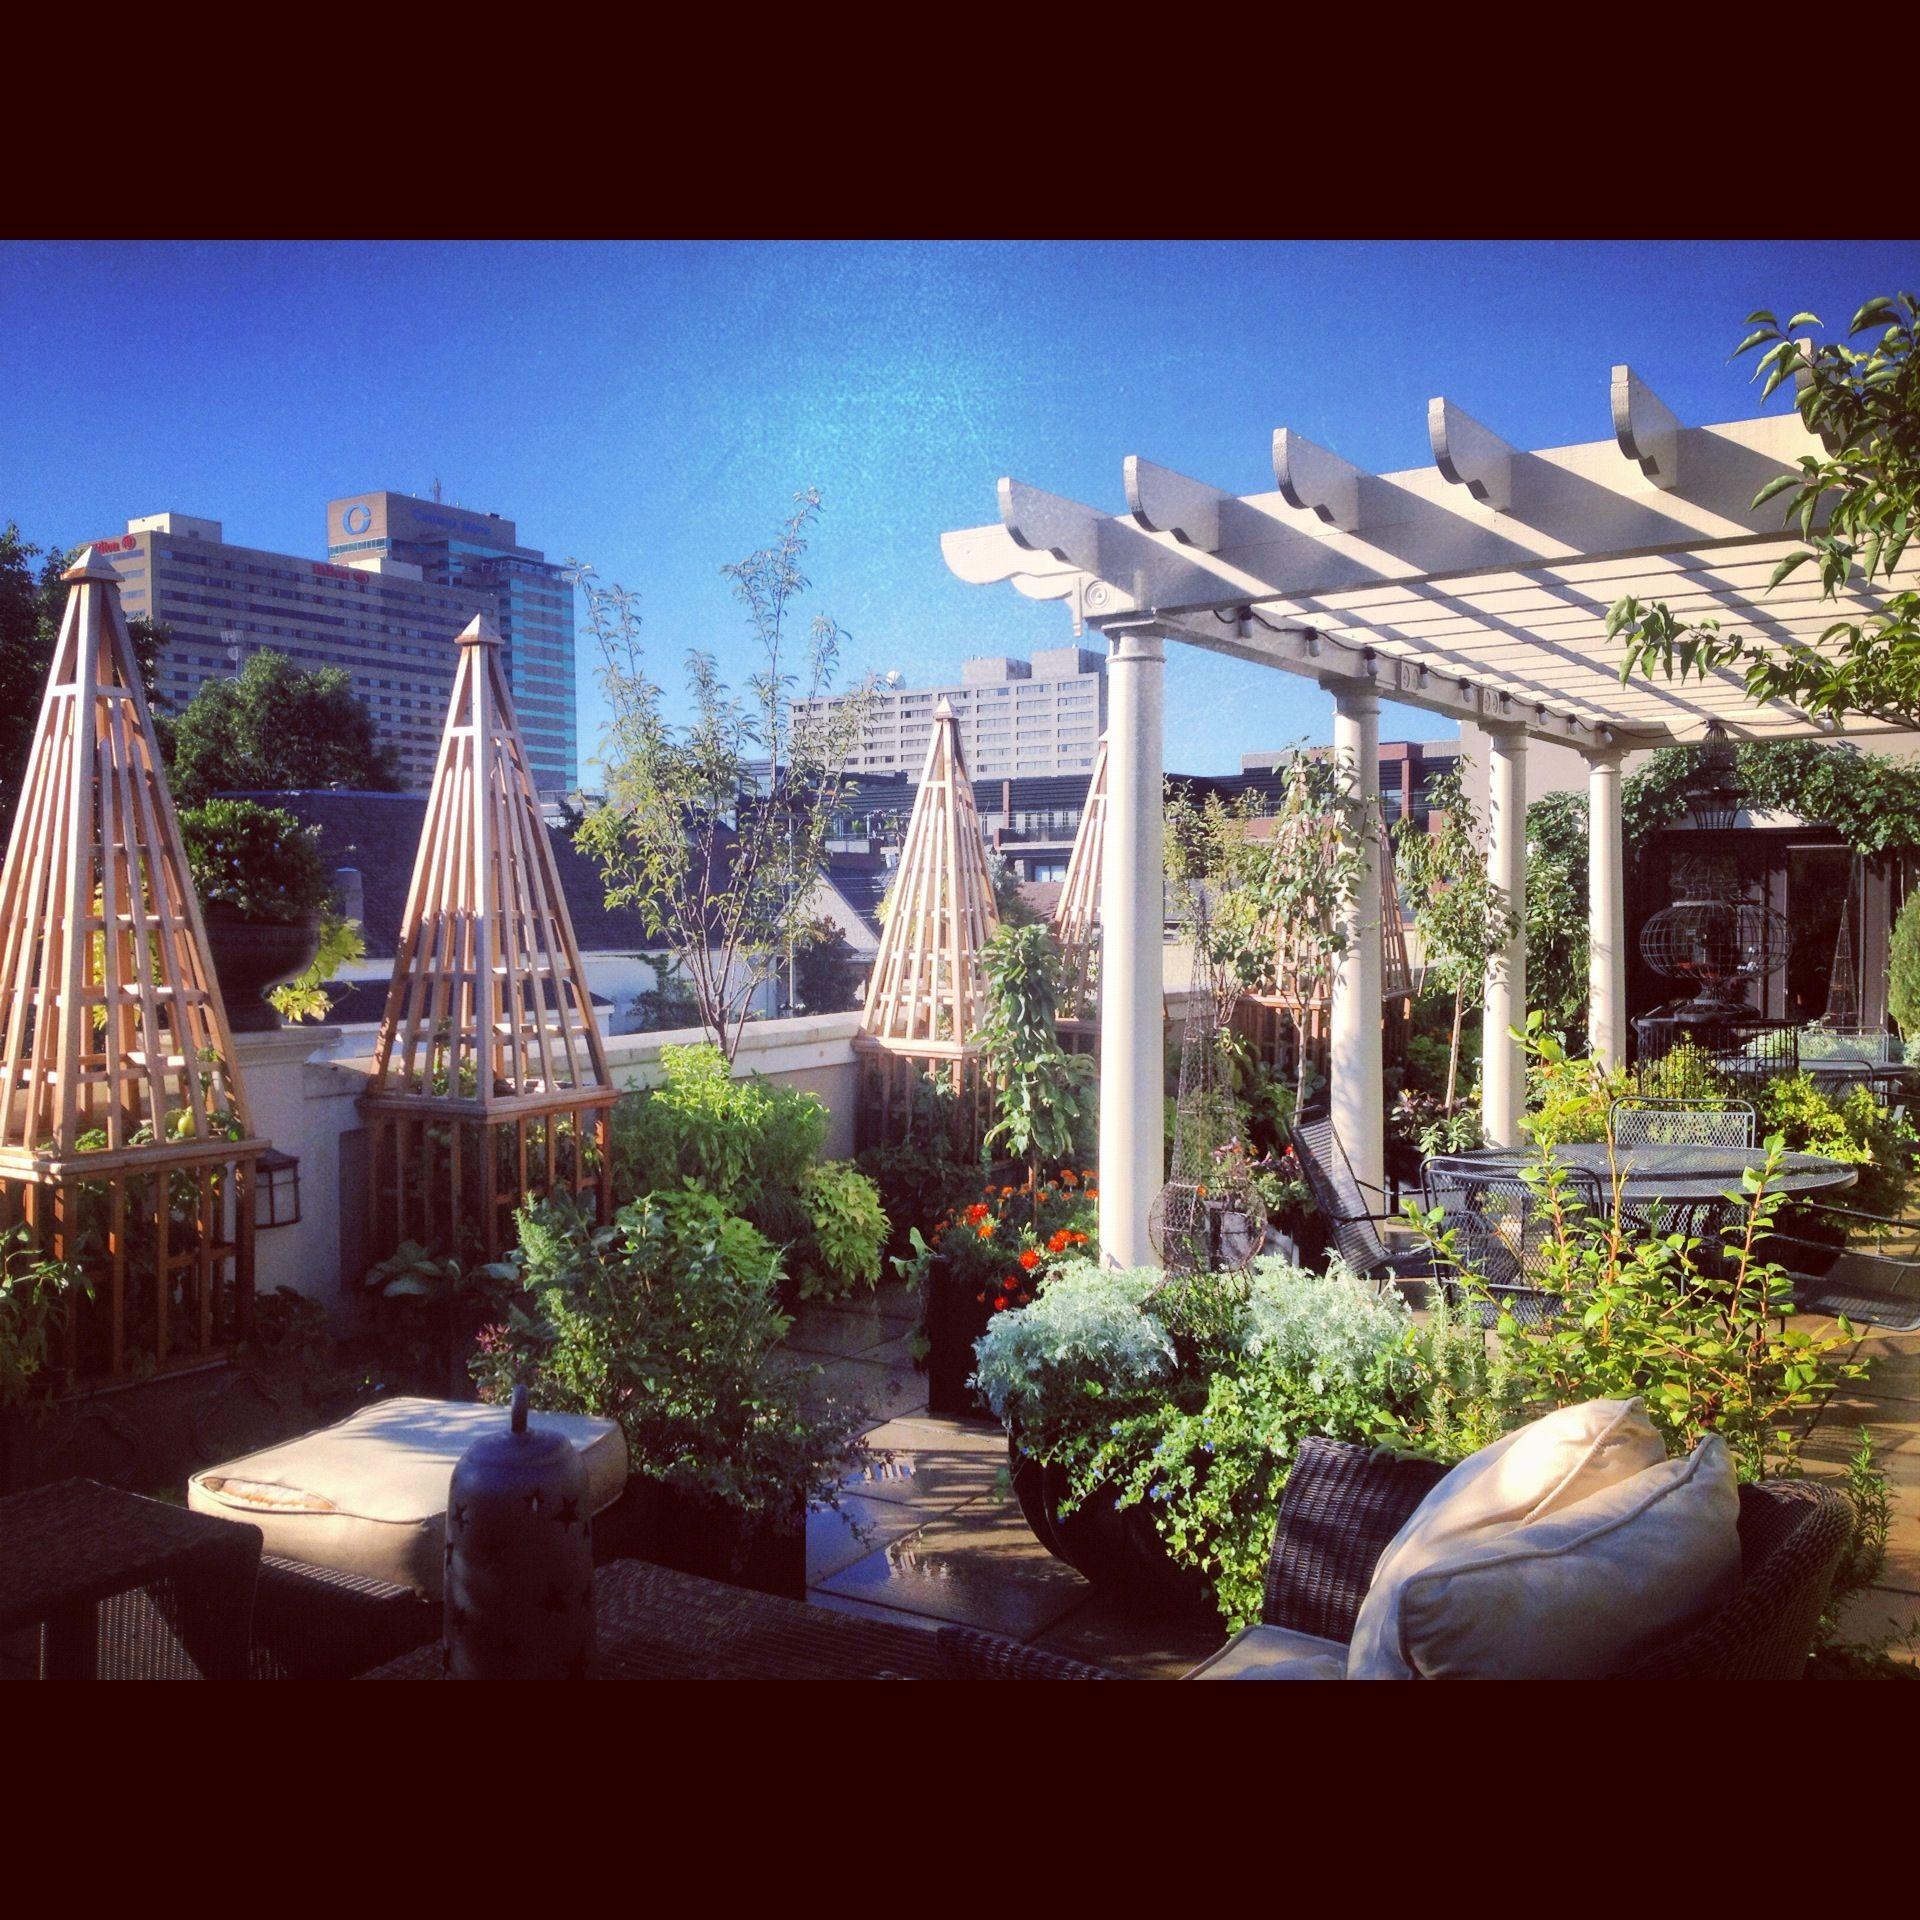 Designerlen Berlin jon carloftis lv harkness rooftop garden ky outdoorsy